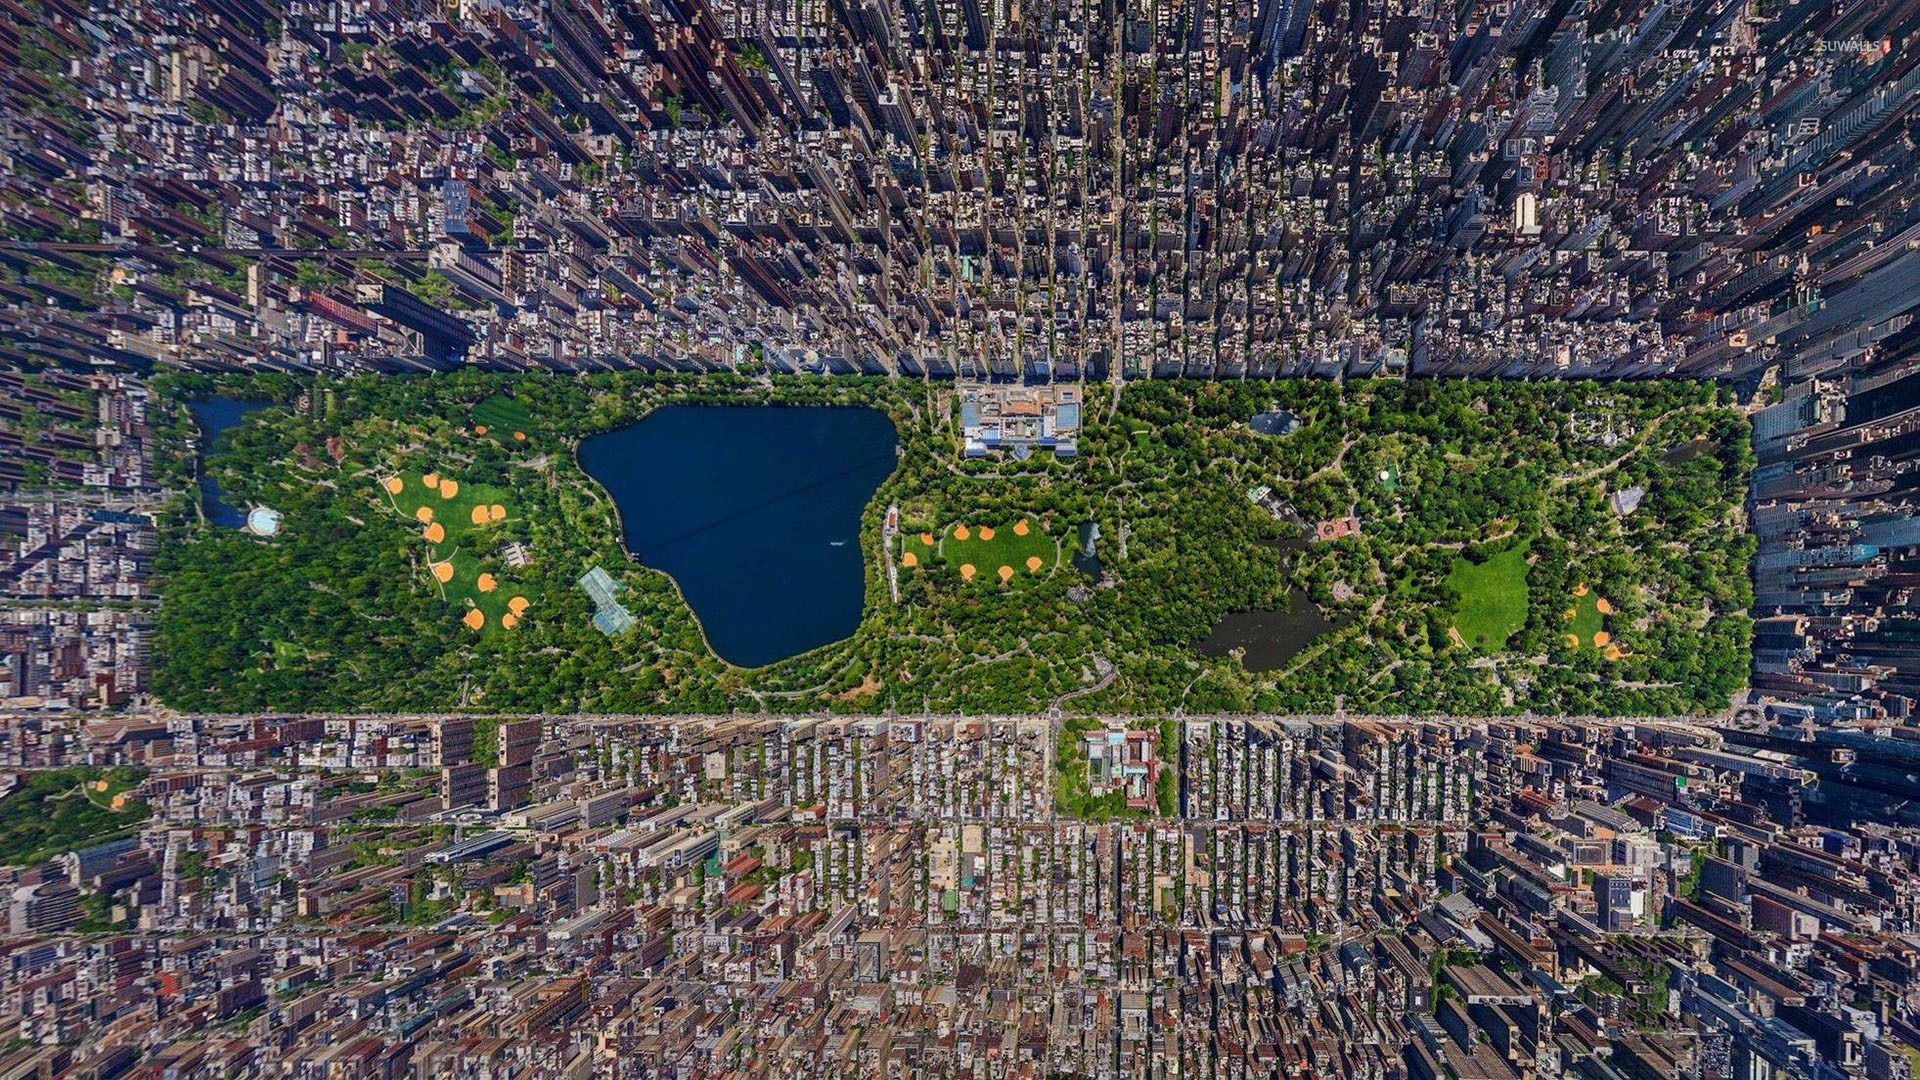 wallpaper 1920x1080 park - photo #16